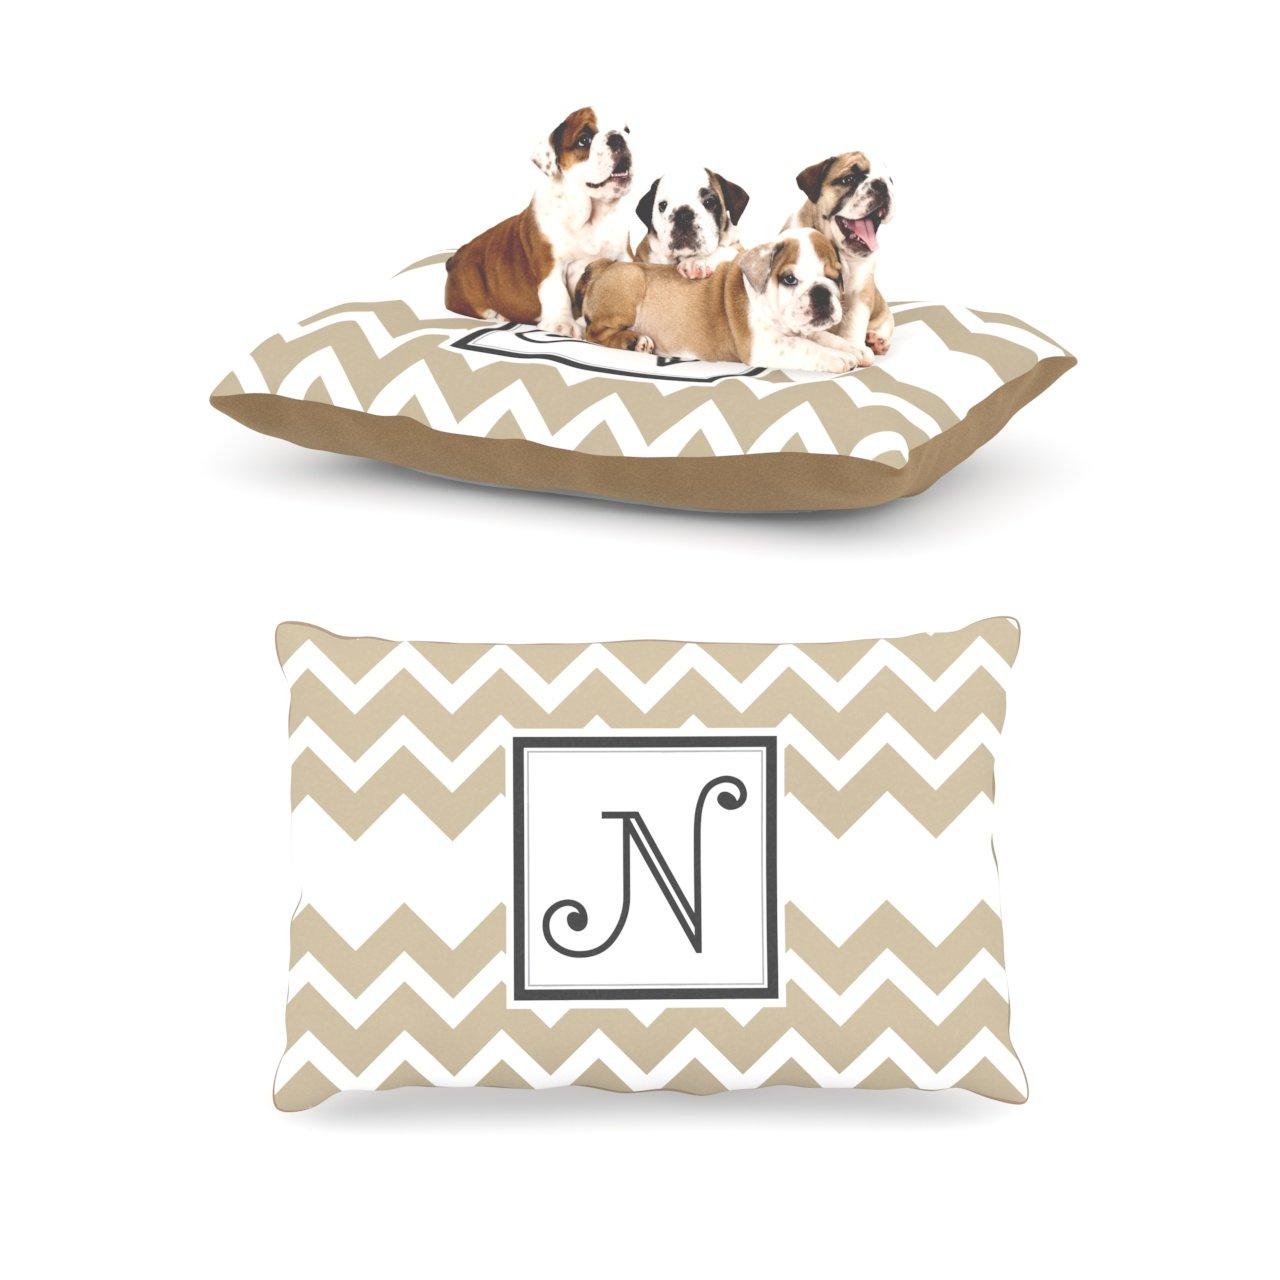 N Large 30  x 40 Kess InHouse Chevron Tan Fleece Dog Bed, 30 by 40Inch, Monogram LetterH